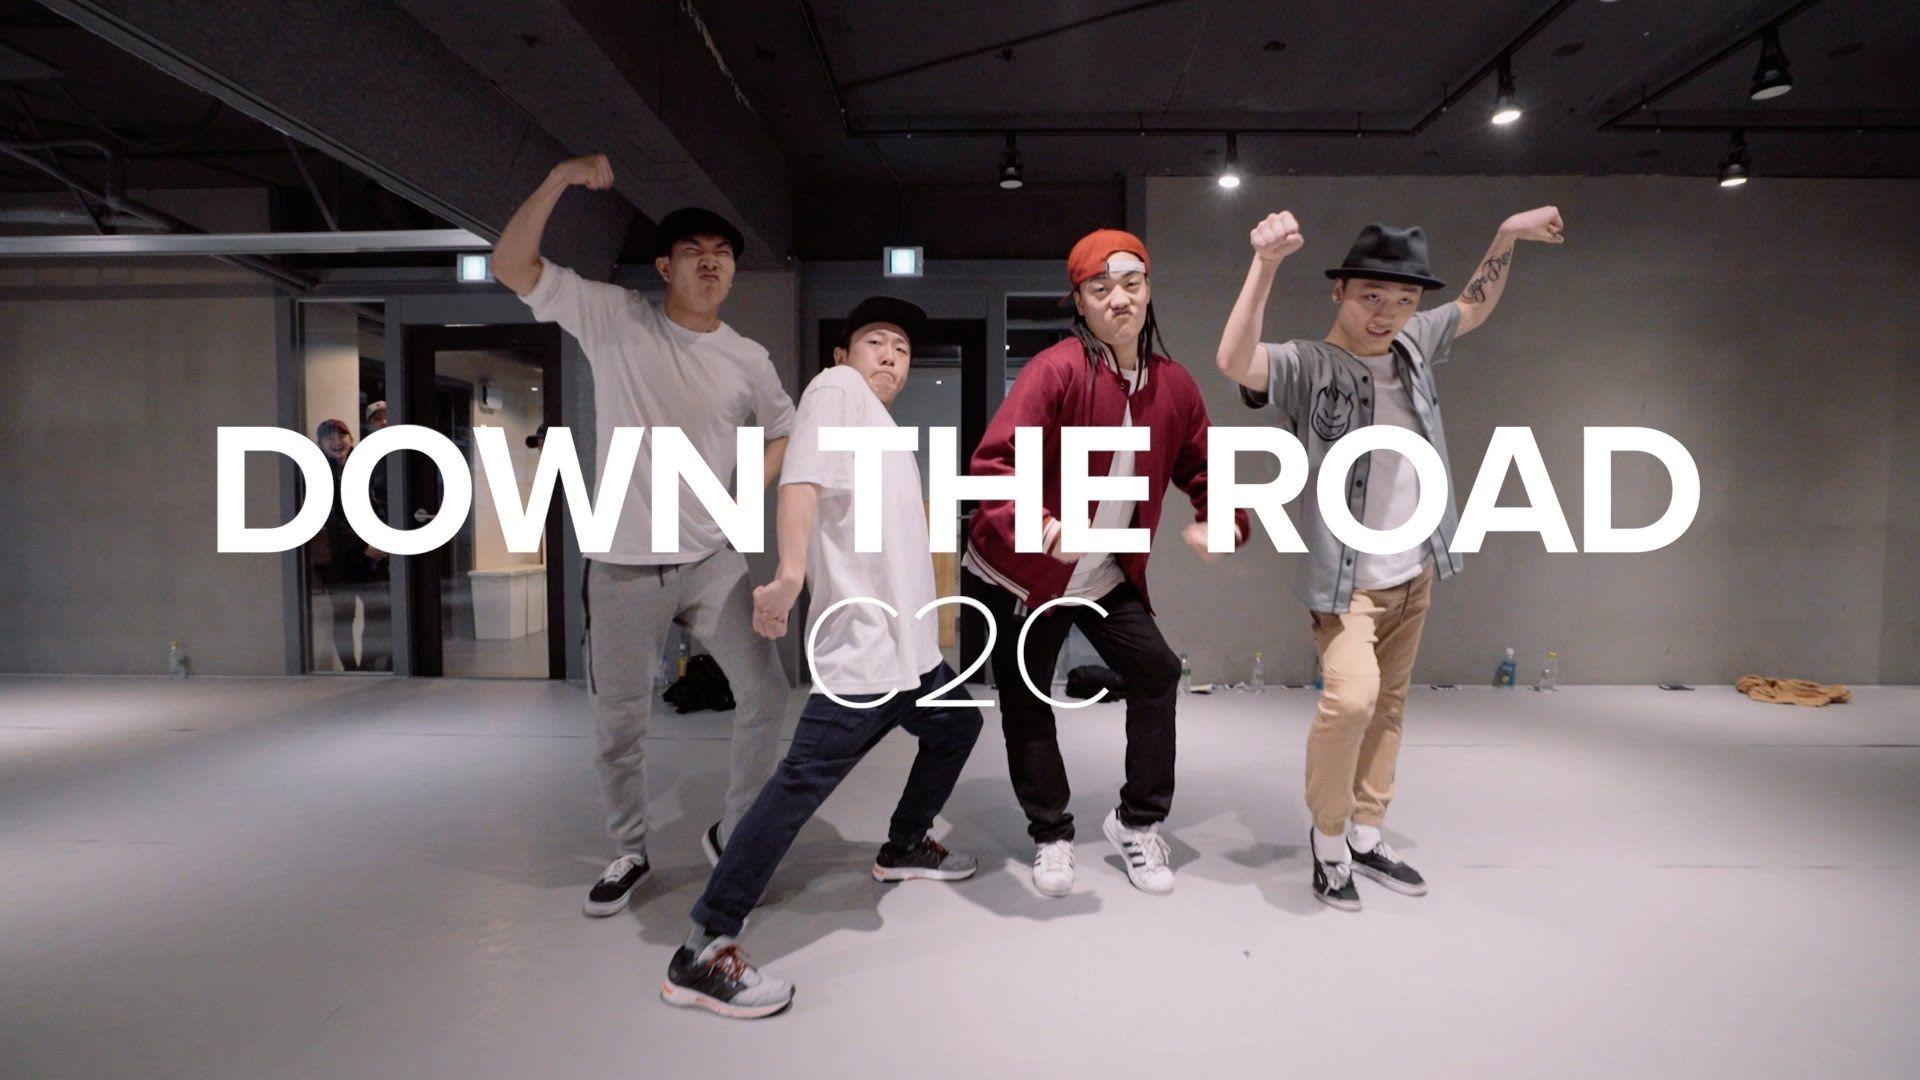 Down The Road C2c Assall Crew Choreography